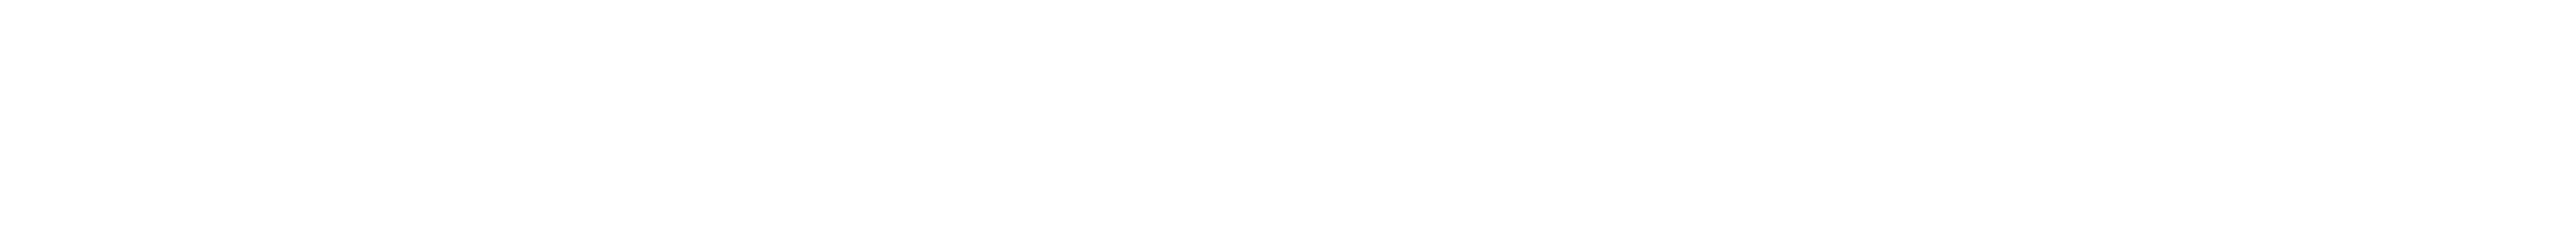 الشراكات logos.png